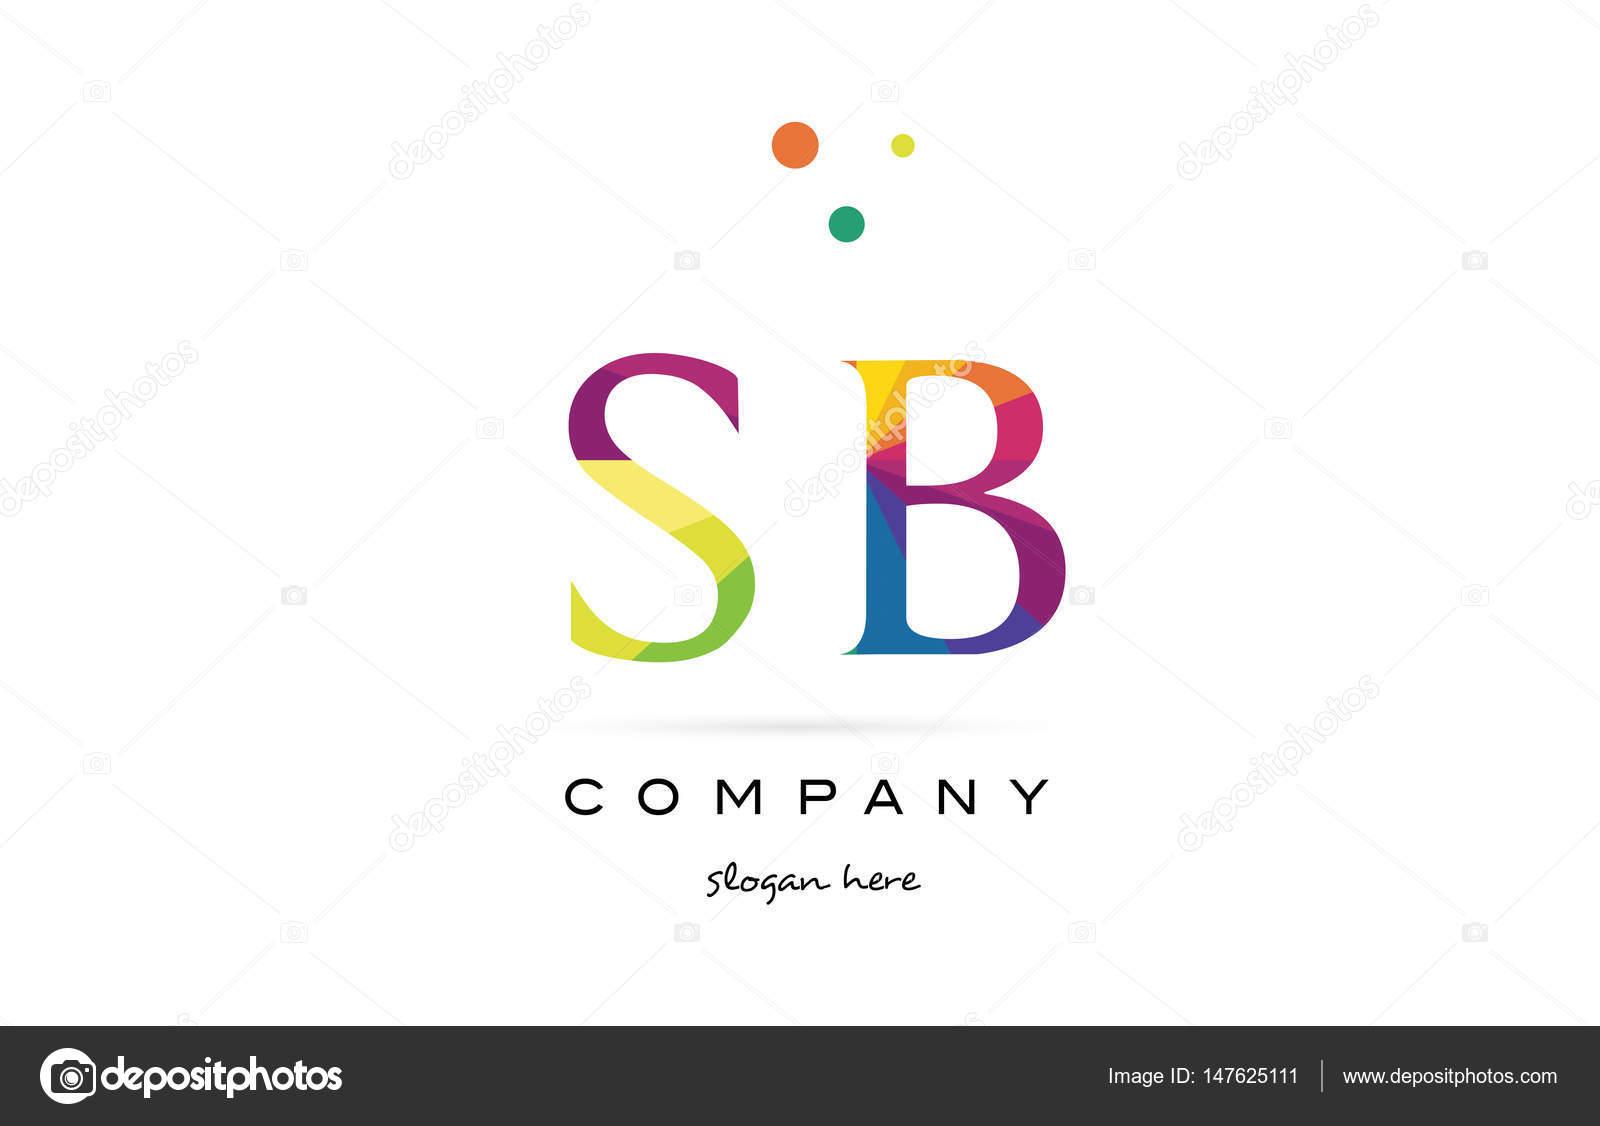 Sb s b creative rainbow colors alphabet letter logo icon — Stock